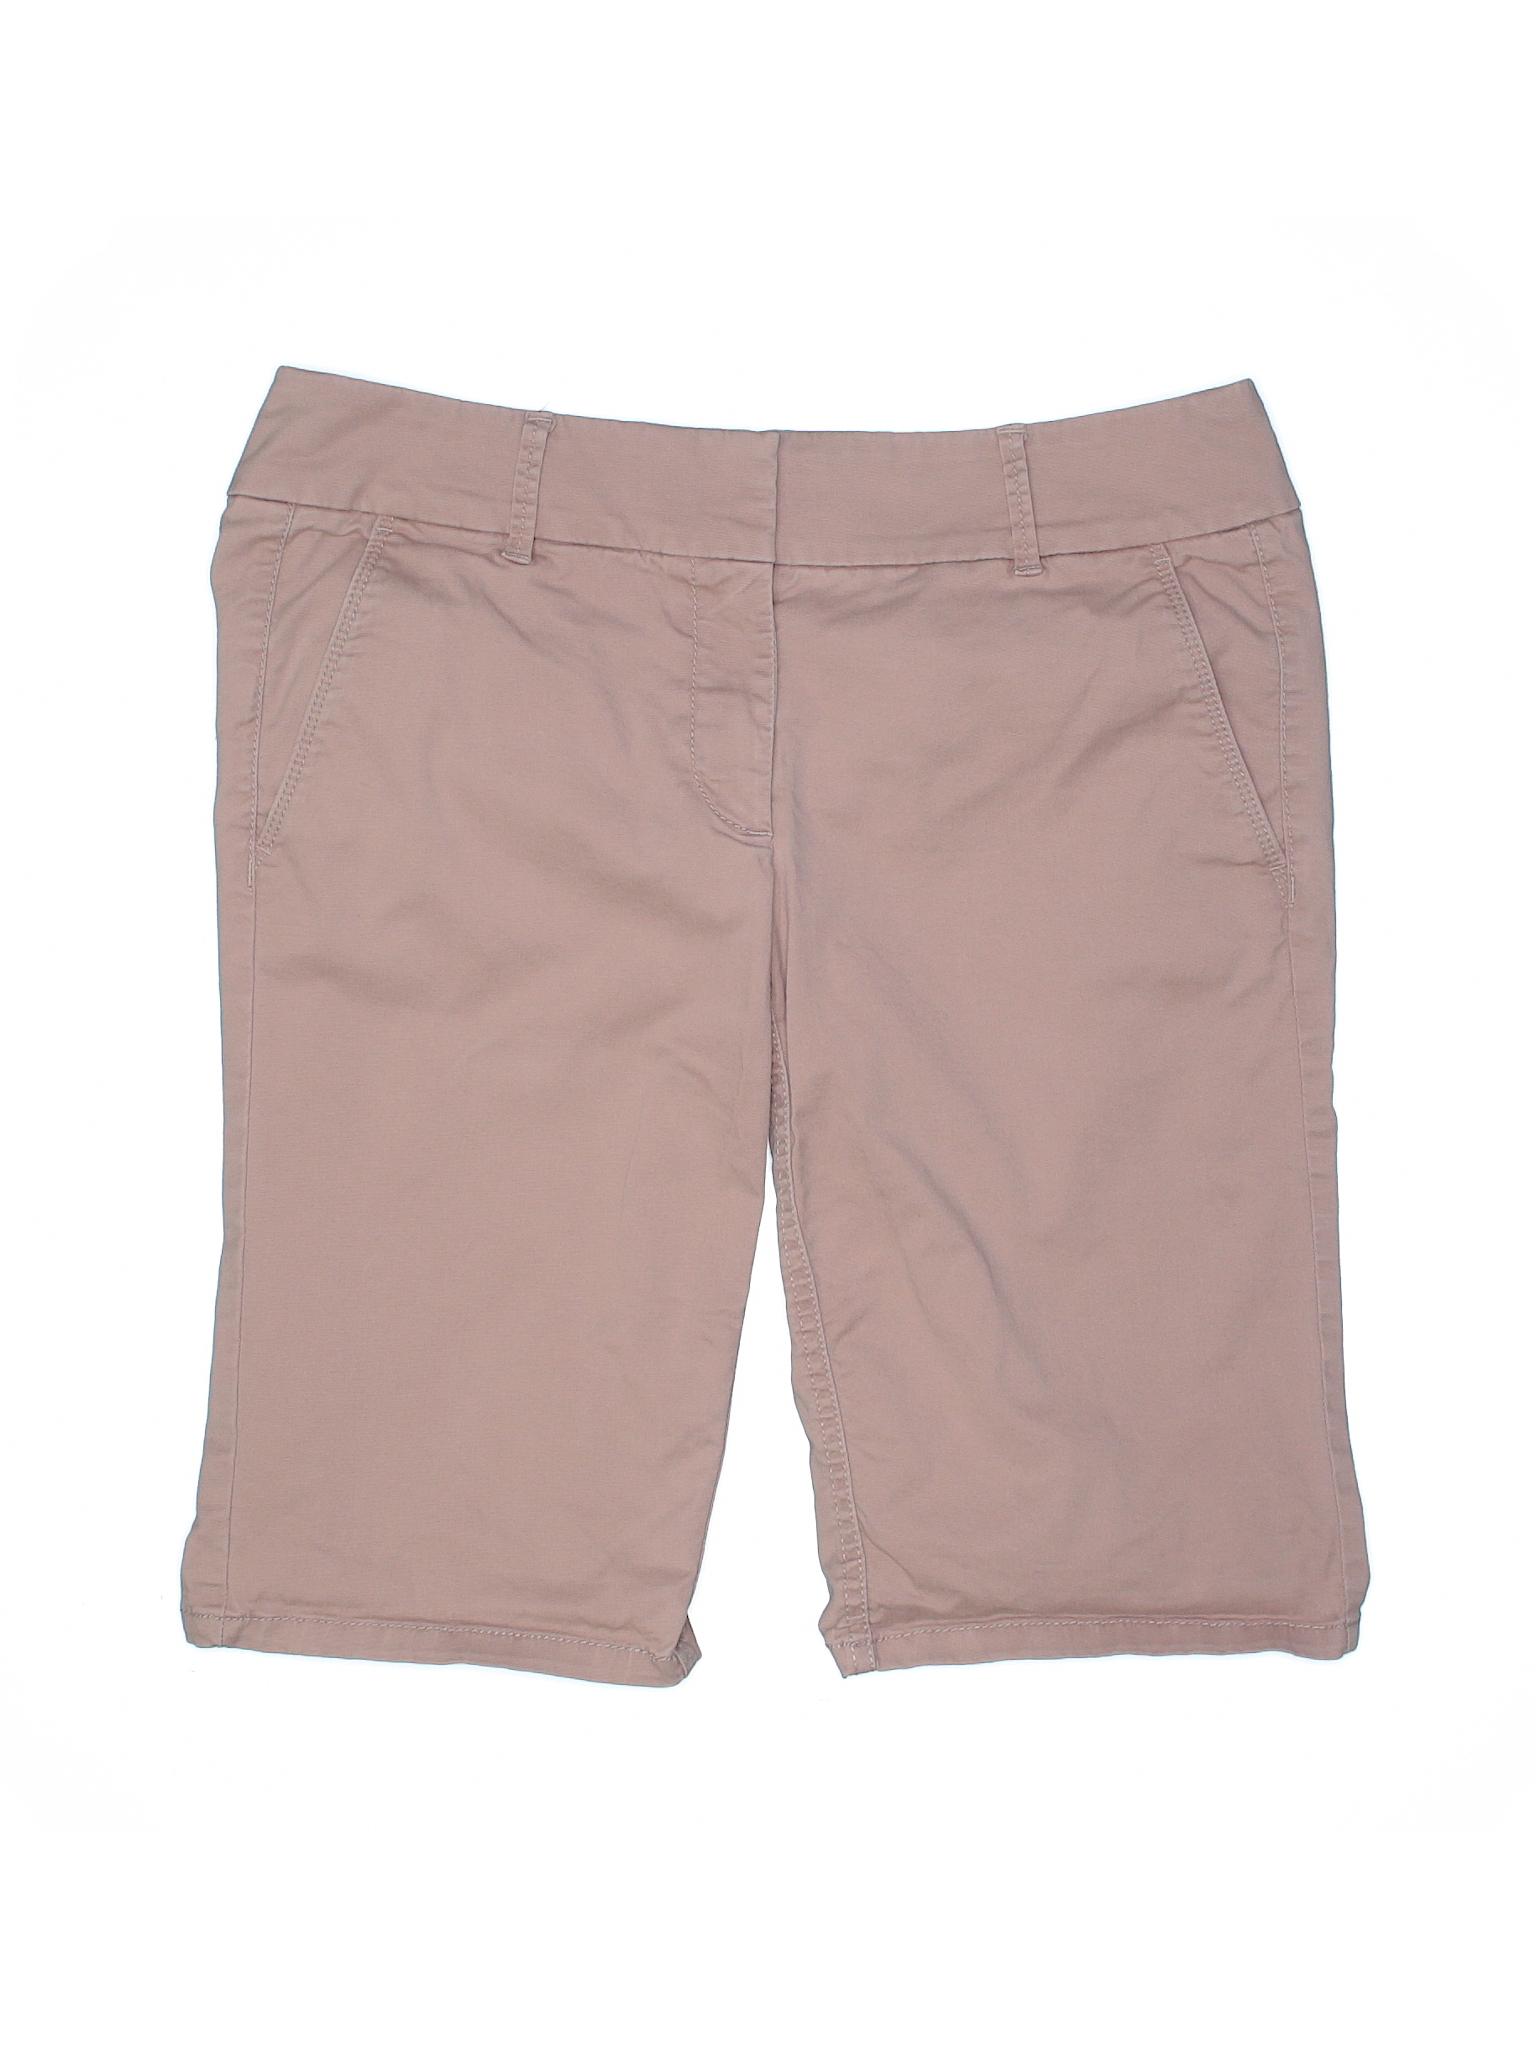 Khaki Shorts Banana leisure Boutique Republic wx7qY6RXt